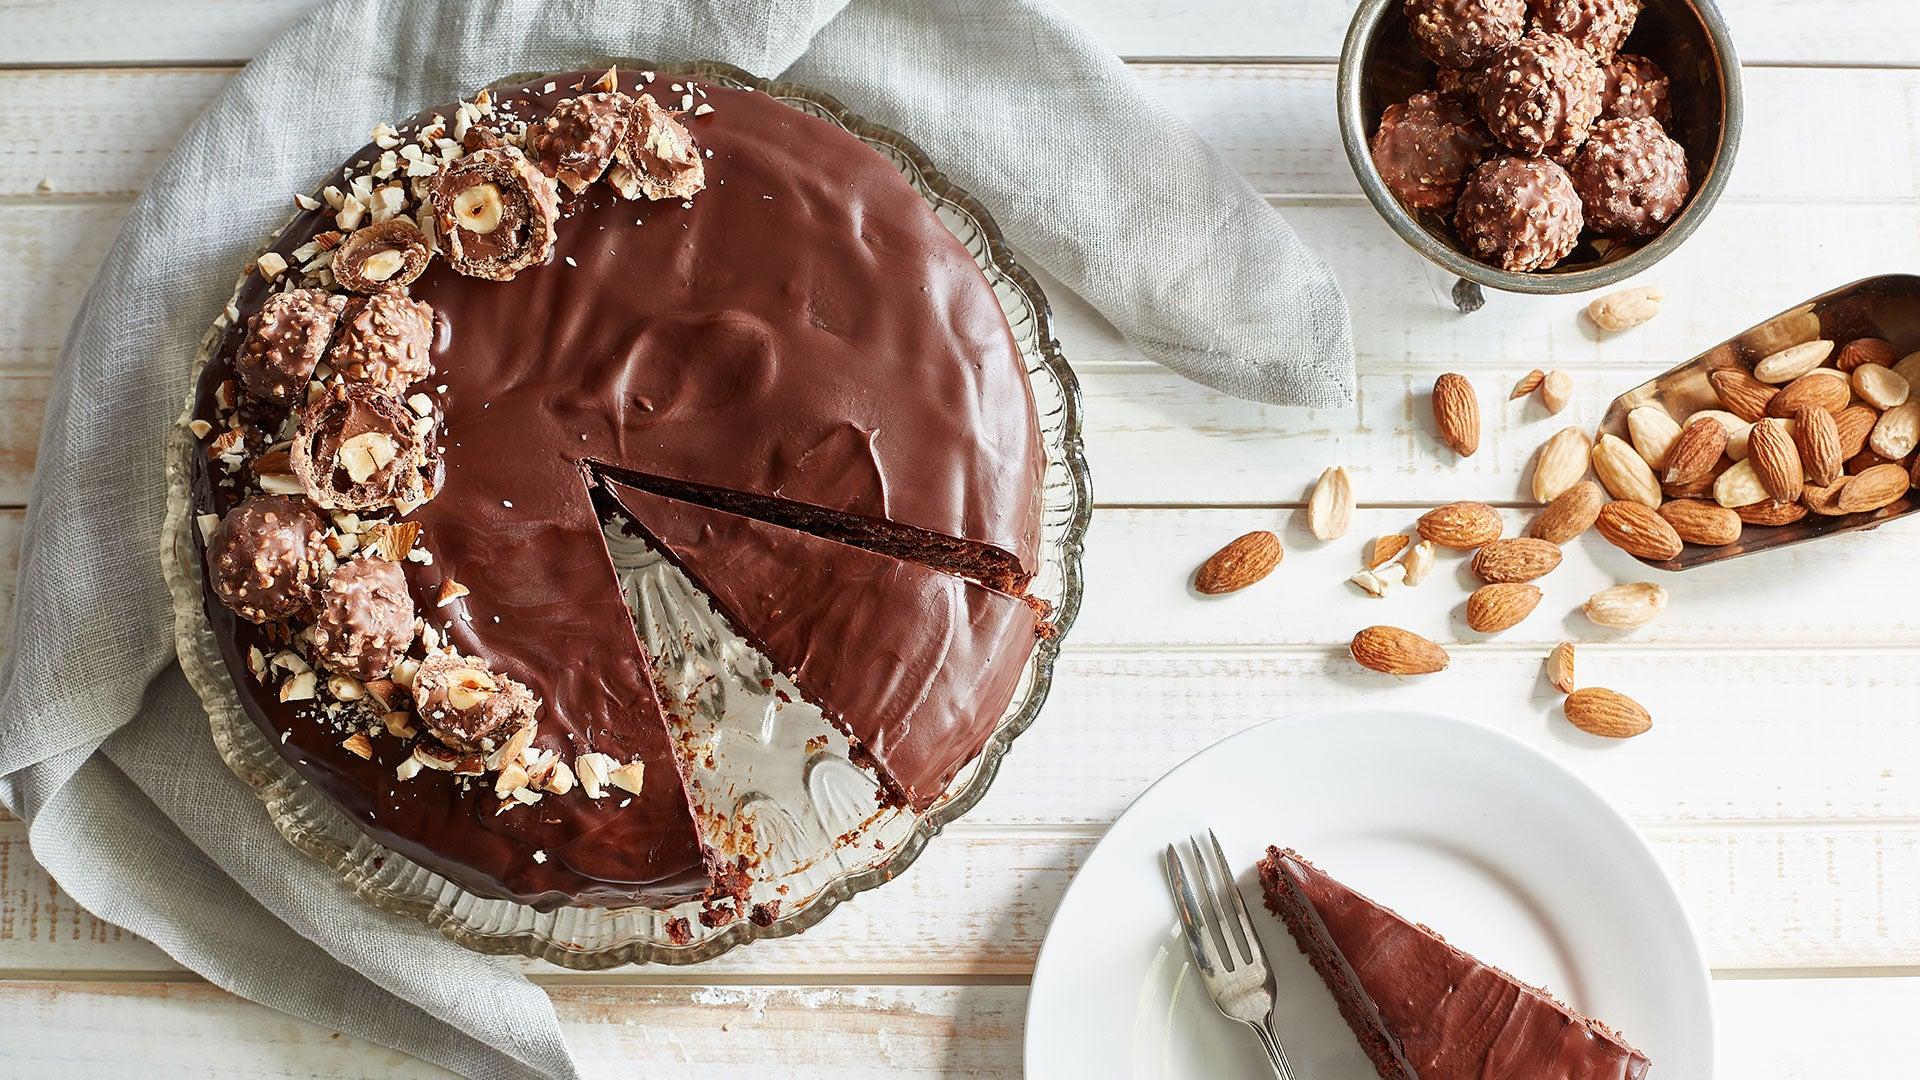 Gluten-Free-Chococlate-Truffle-Sachertorte_Header.jpg